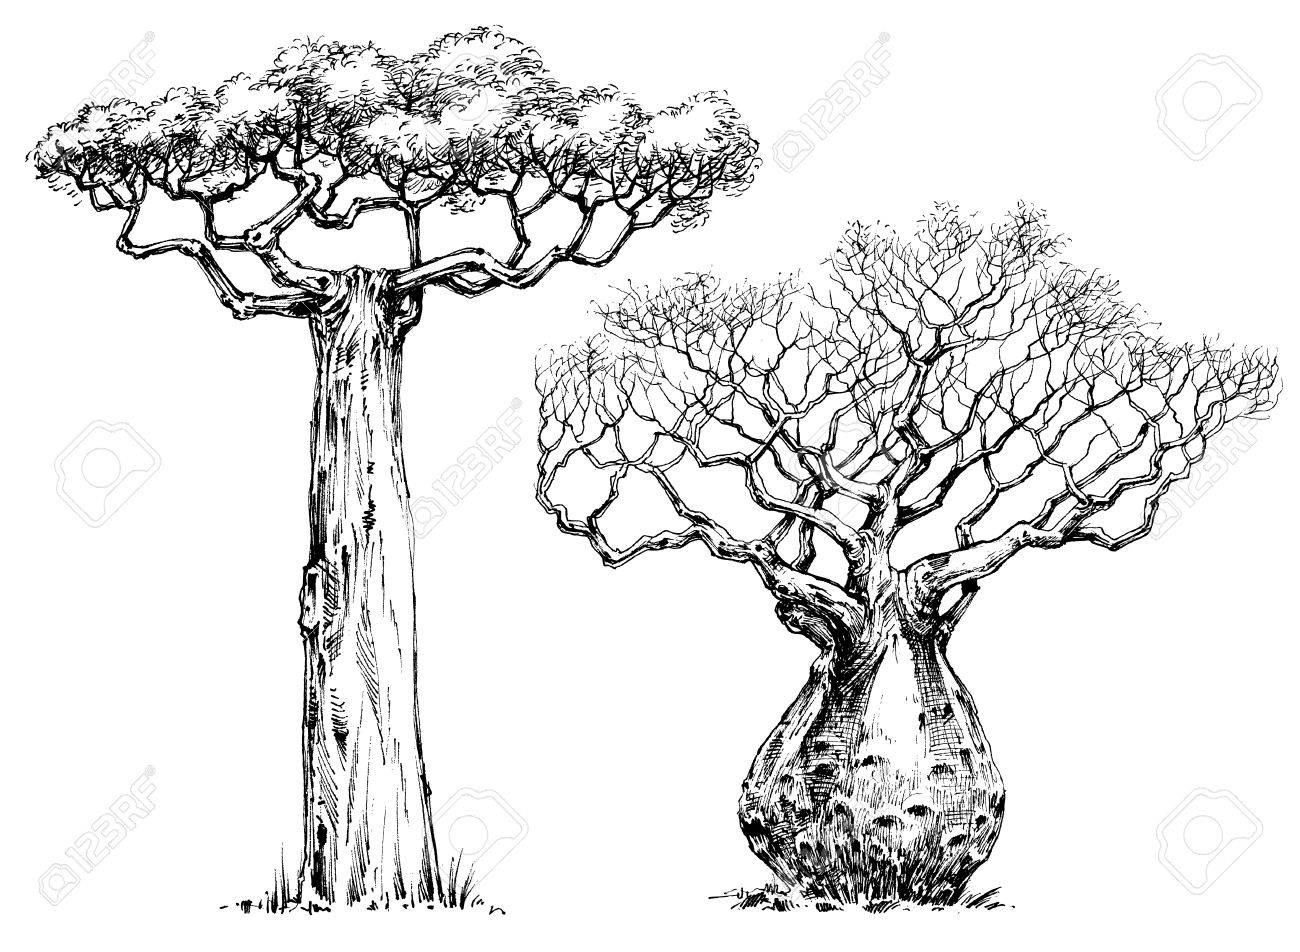 African iconic tree, baobab tree - 55852473